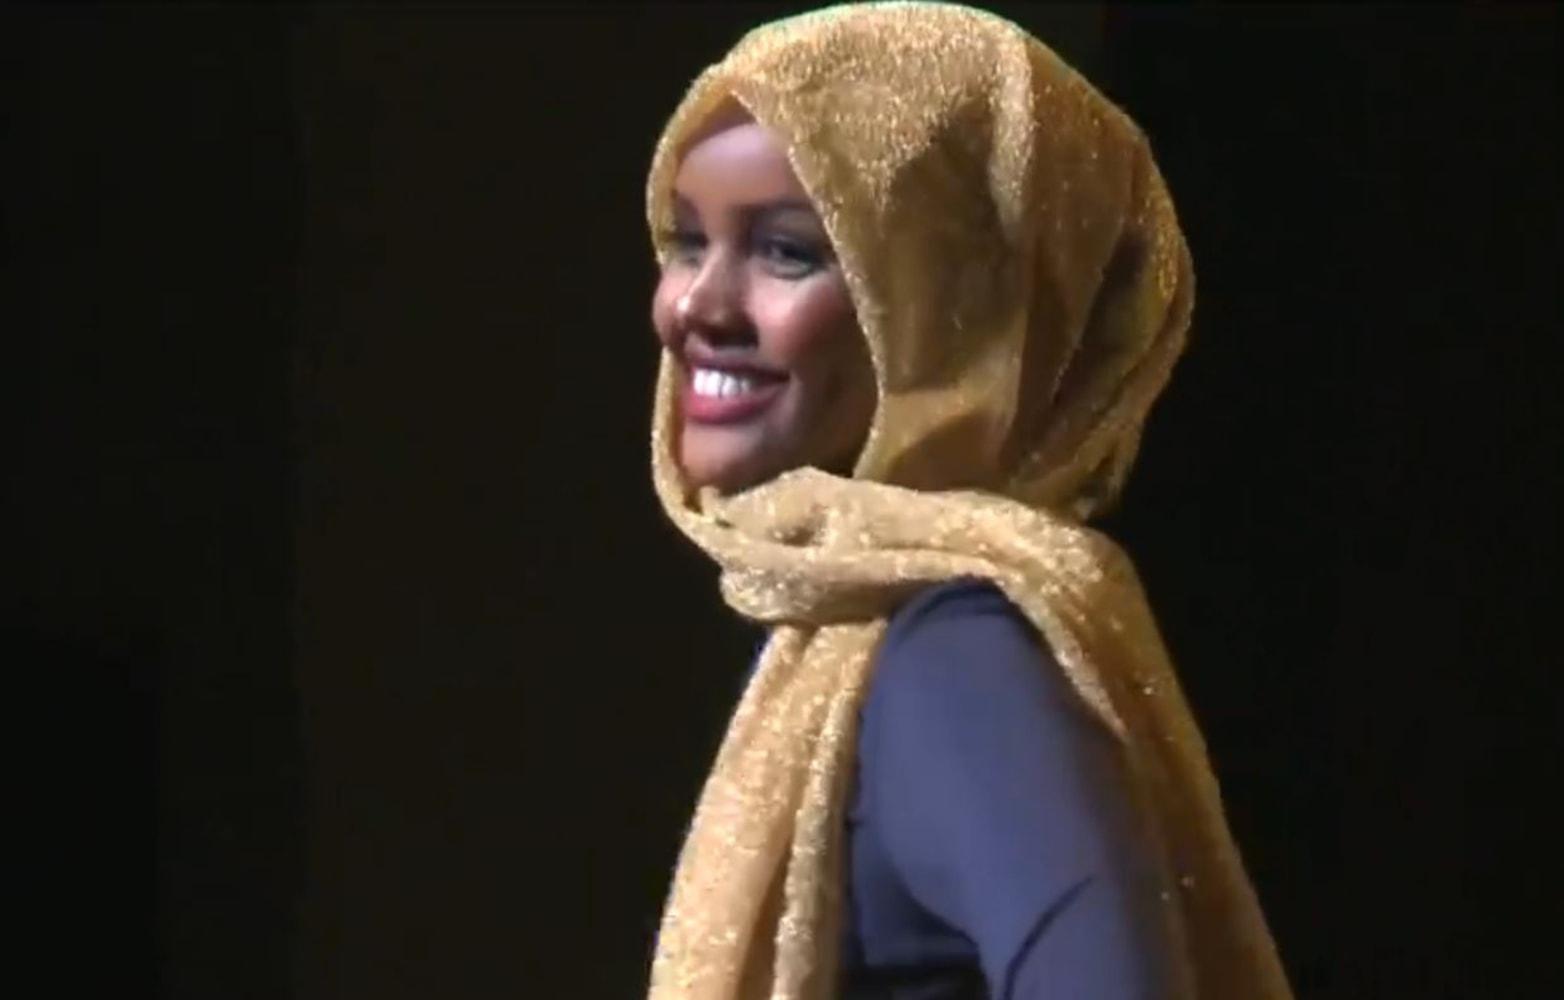 Somali hijab muslim teen girl in australia - 1 part 10